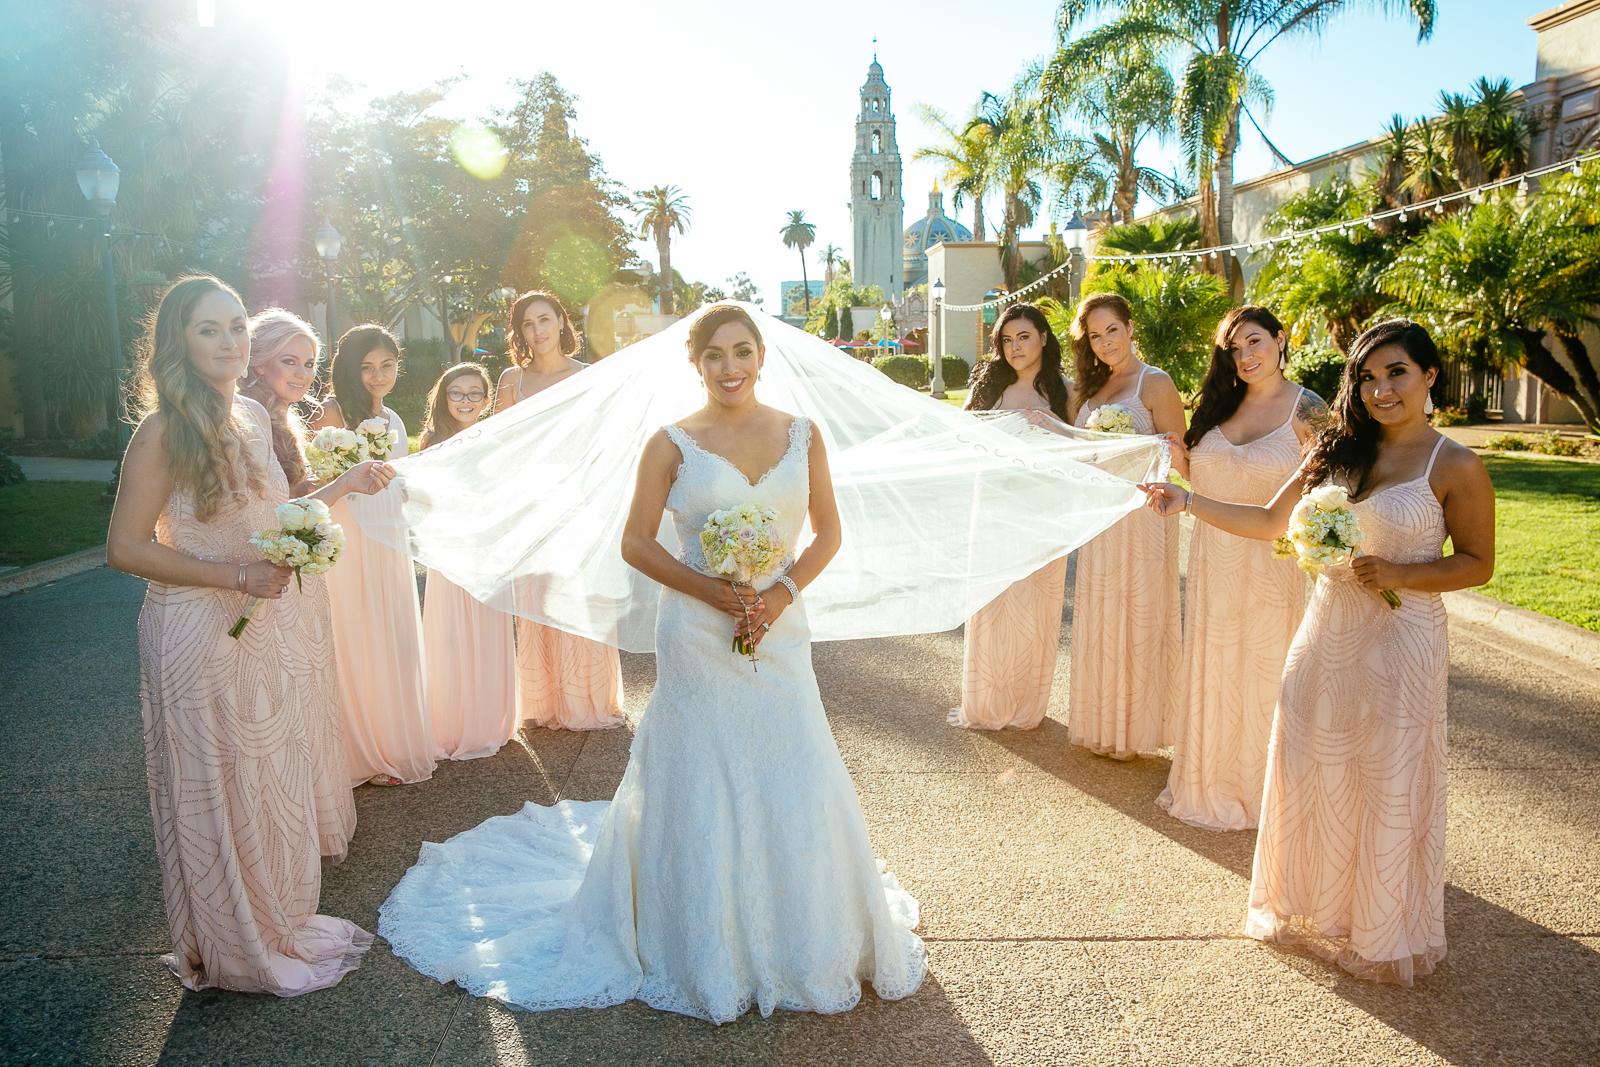 ANGELINE_&_JESUS_WEDDING_LAFAYETTE_HOTEL_2015_2015_IMG_3402.JPG